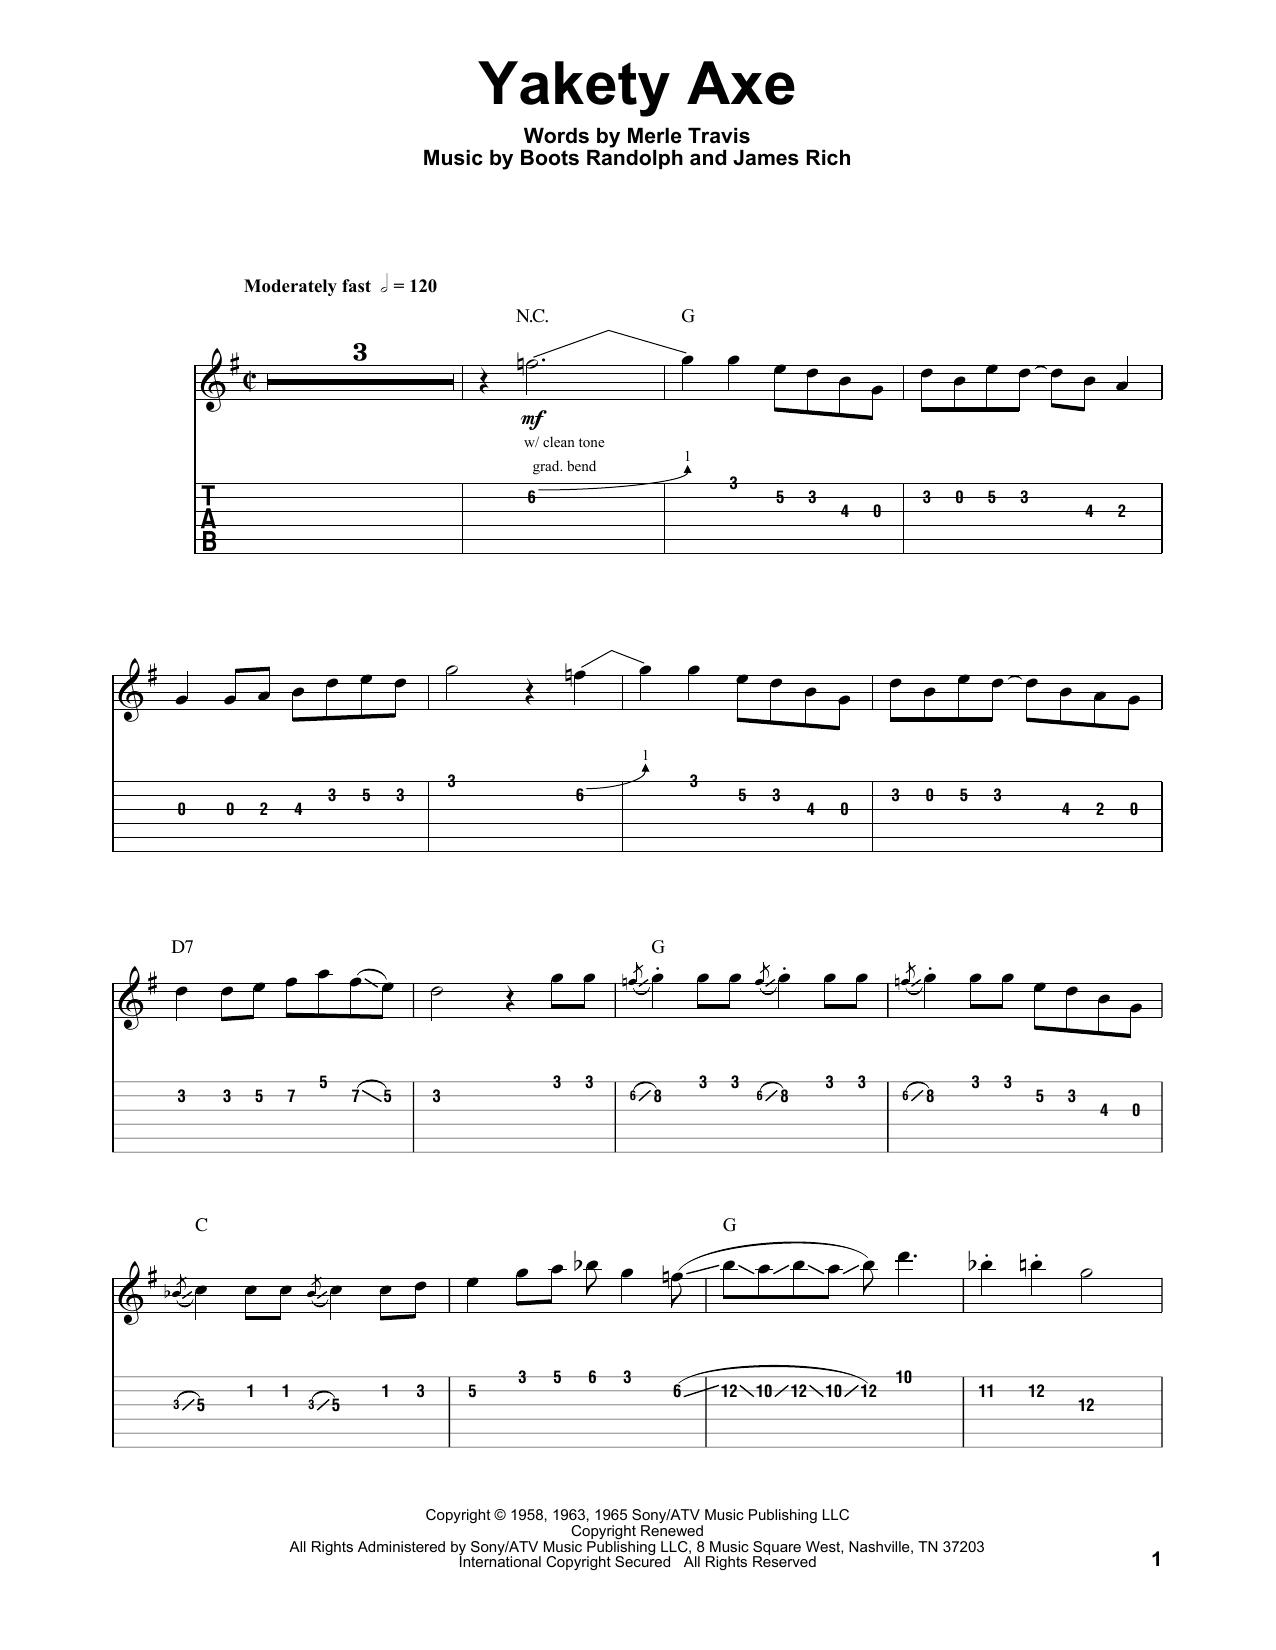 Chet Atkins Yakety Axe sheet music notes and chords. Download Printable PDF.